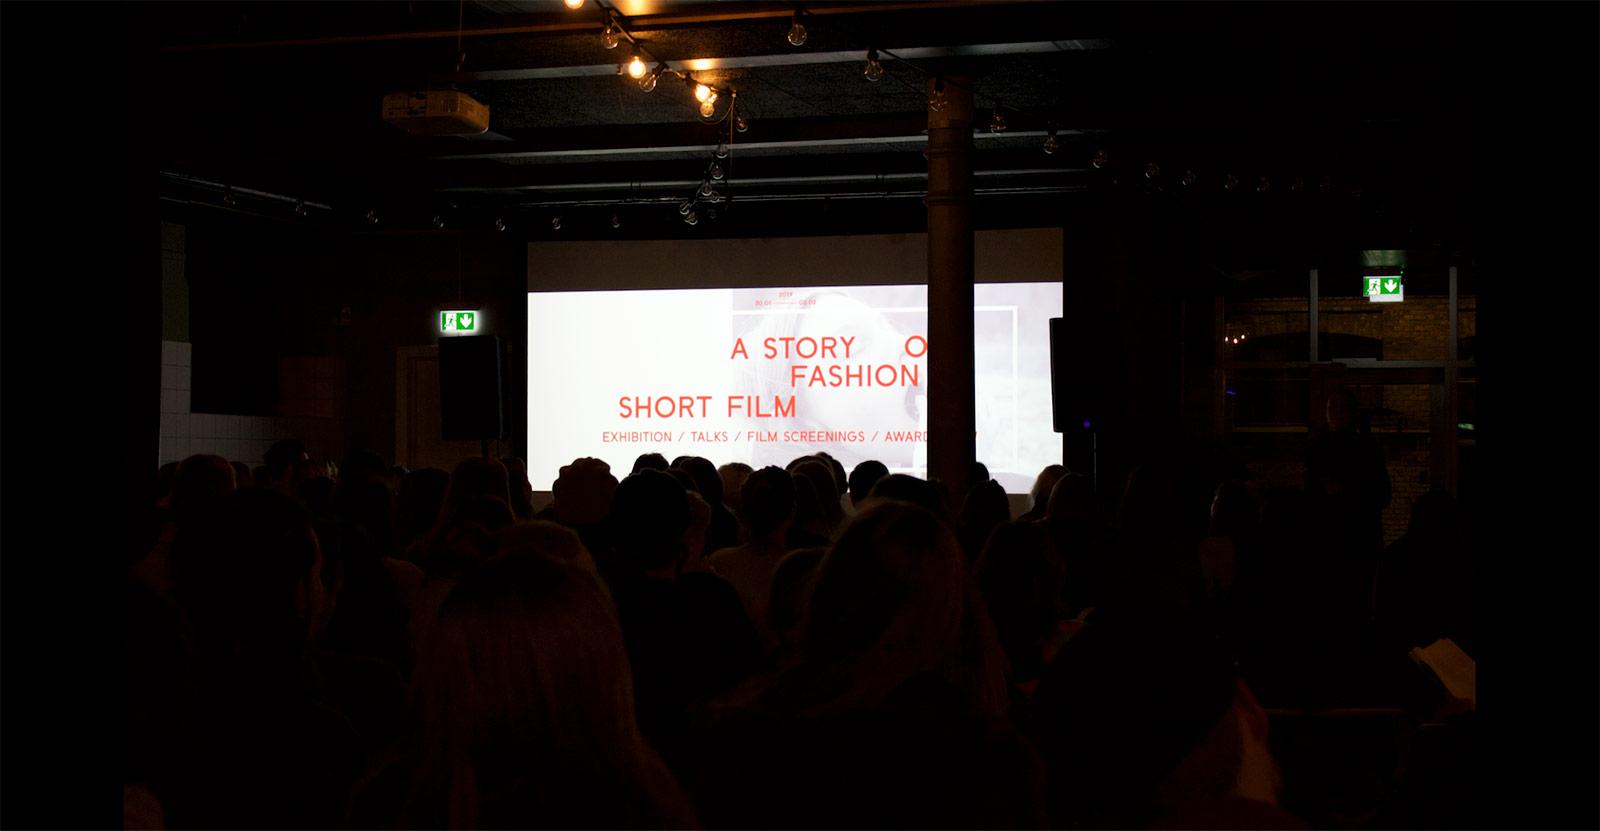 Copenhagen fashion film festival 2019